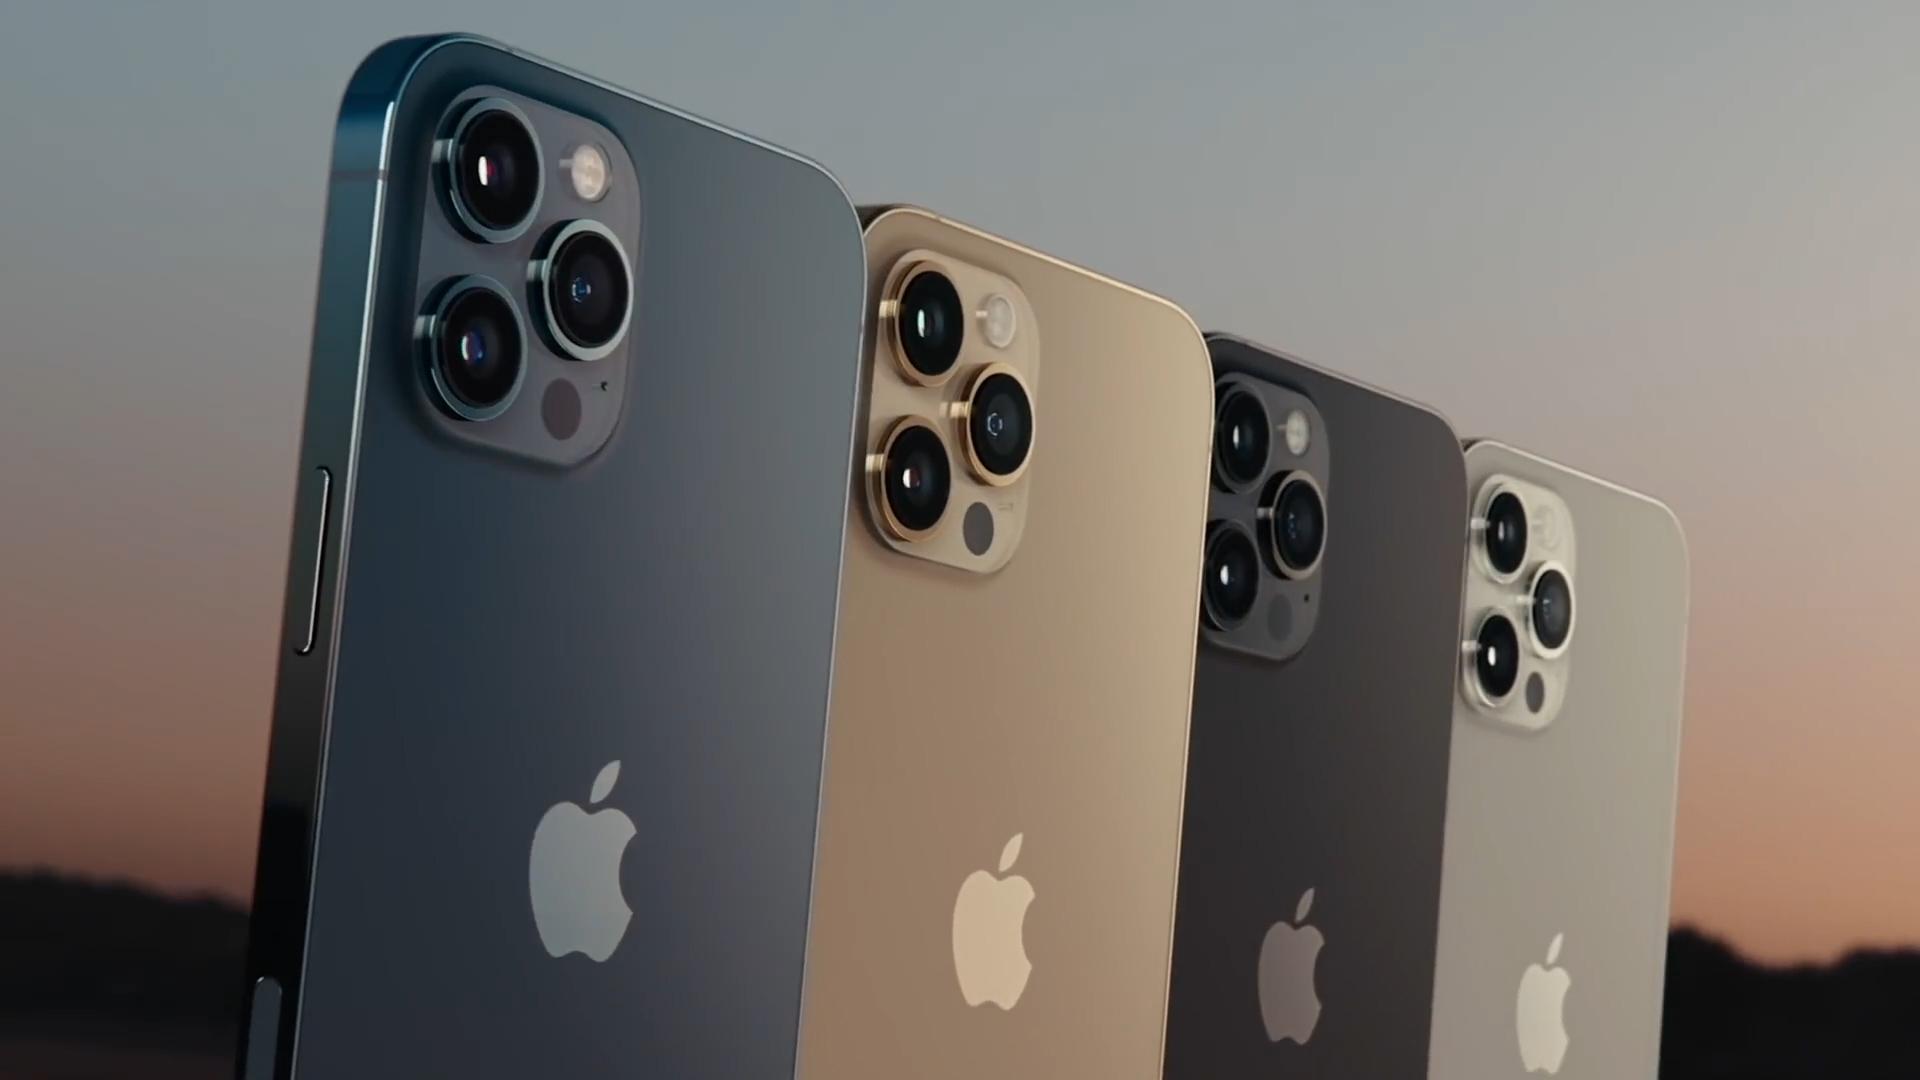 iphone12和iphone12pro区别(两者区别介绍)